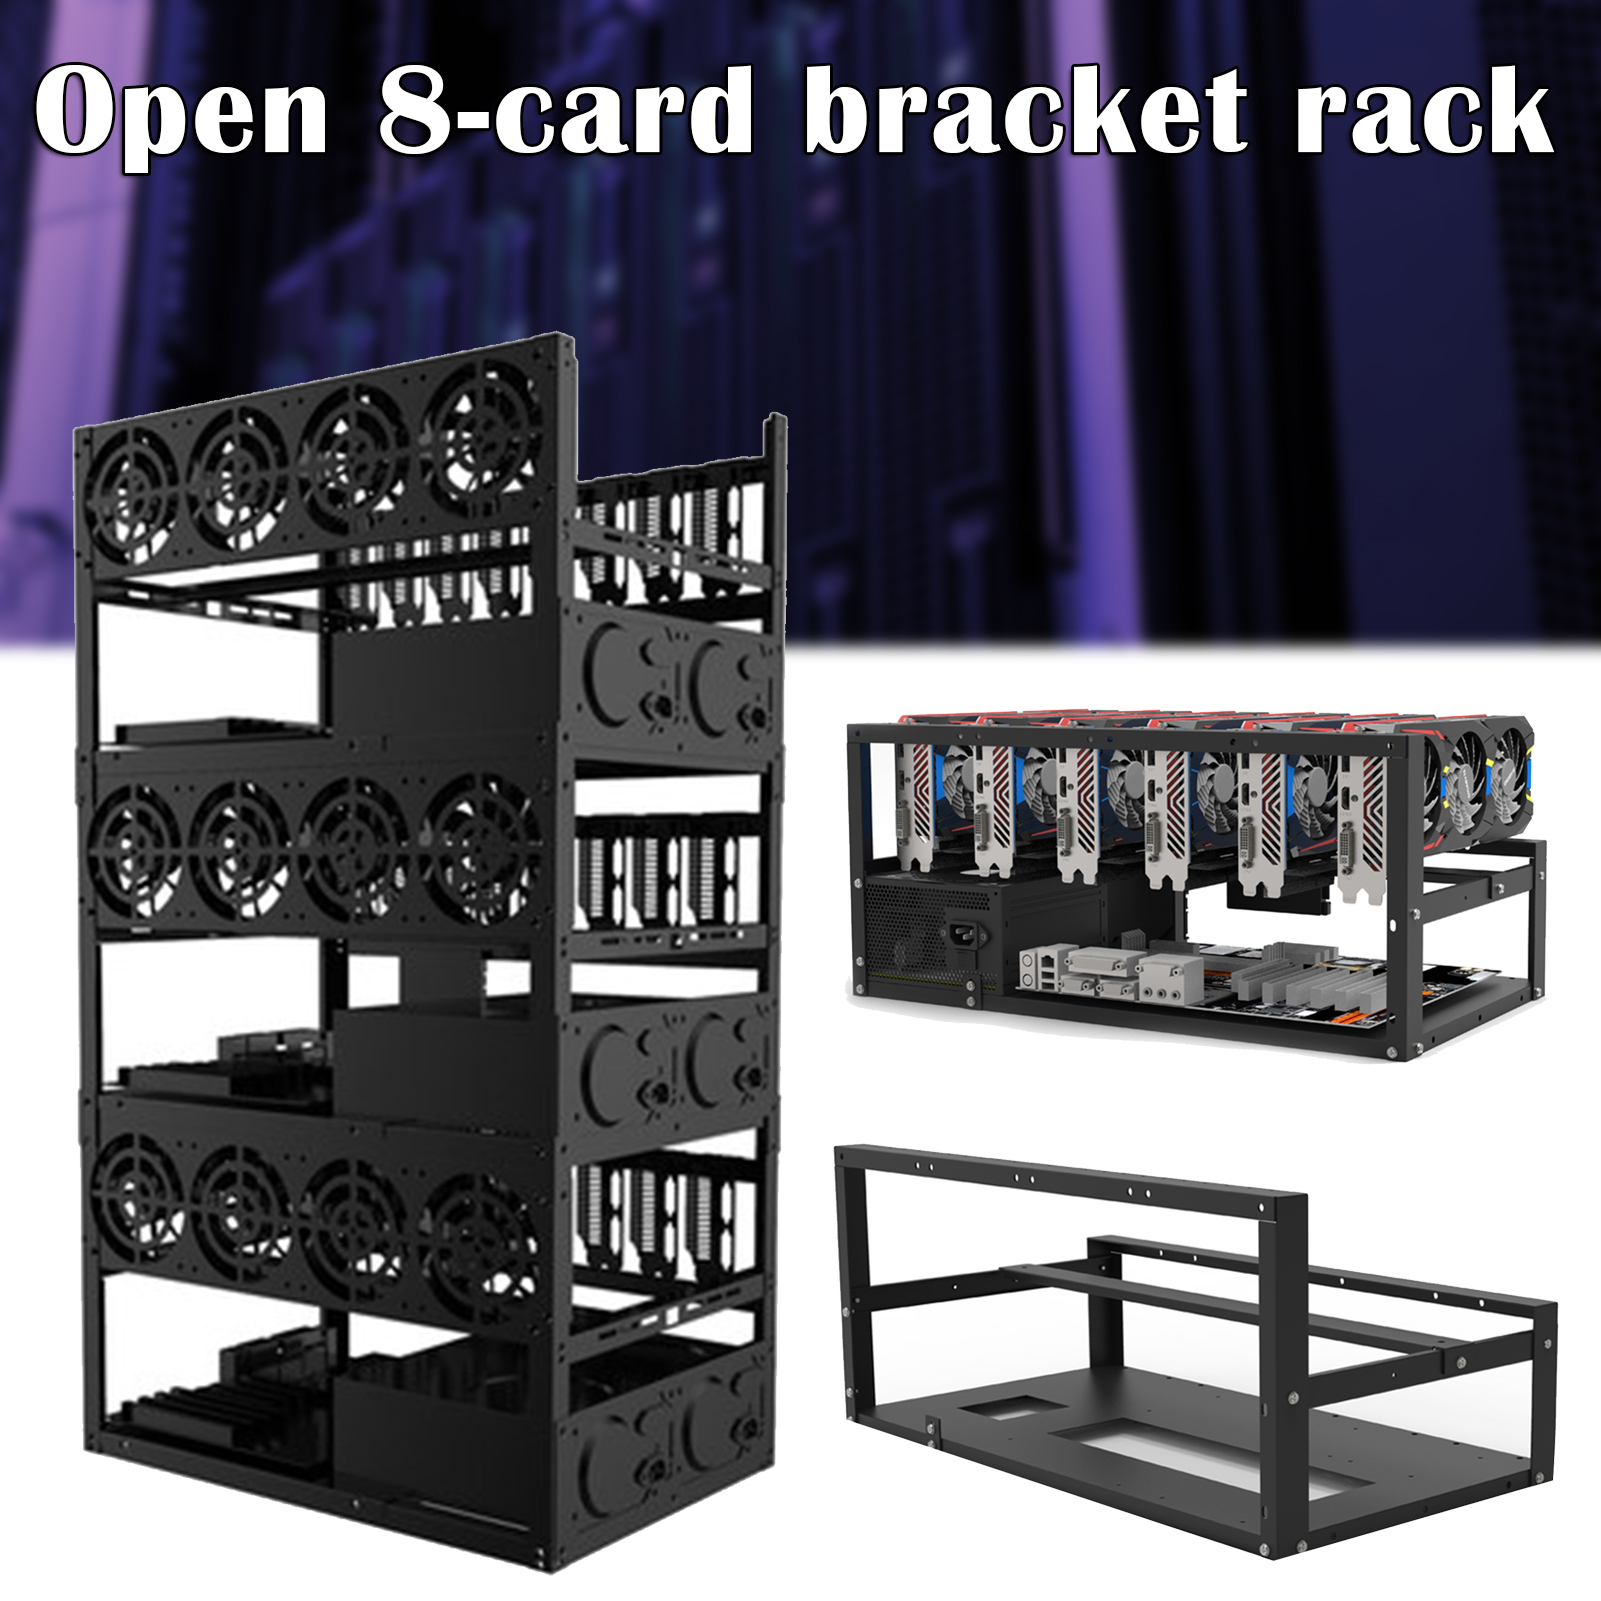 Mining Case Rack Motherboard Bracket Open Mining Rig Frame ETH/ETC/ZEC Ether Accessory Tools for 6 GPU